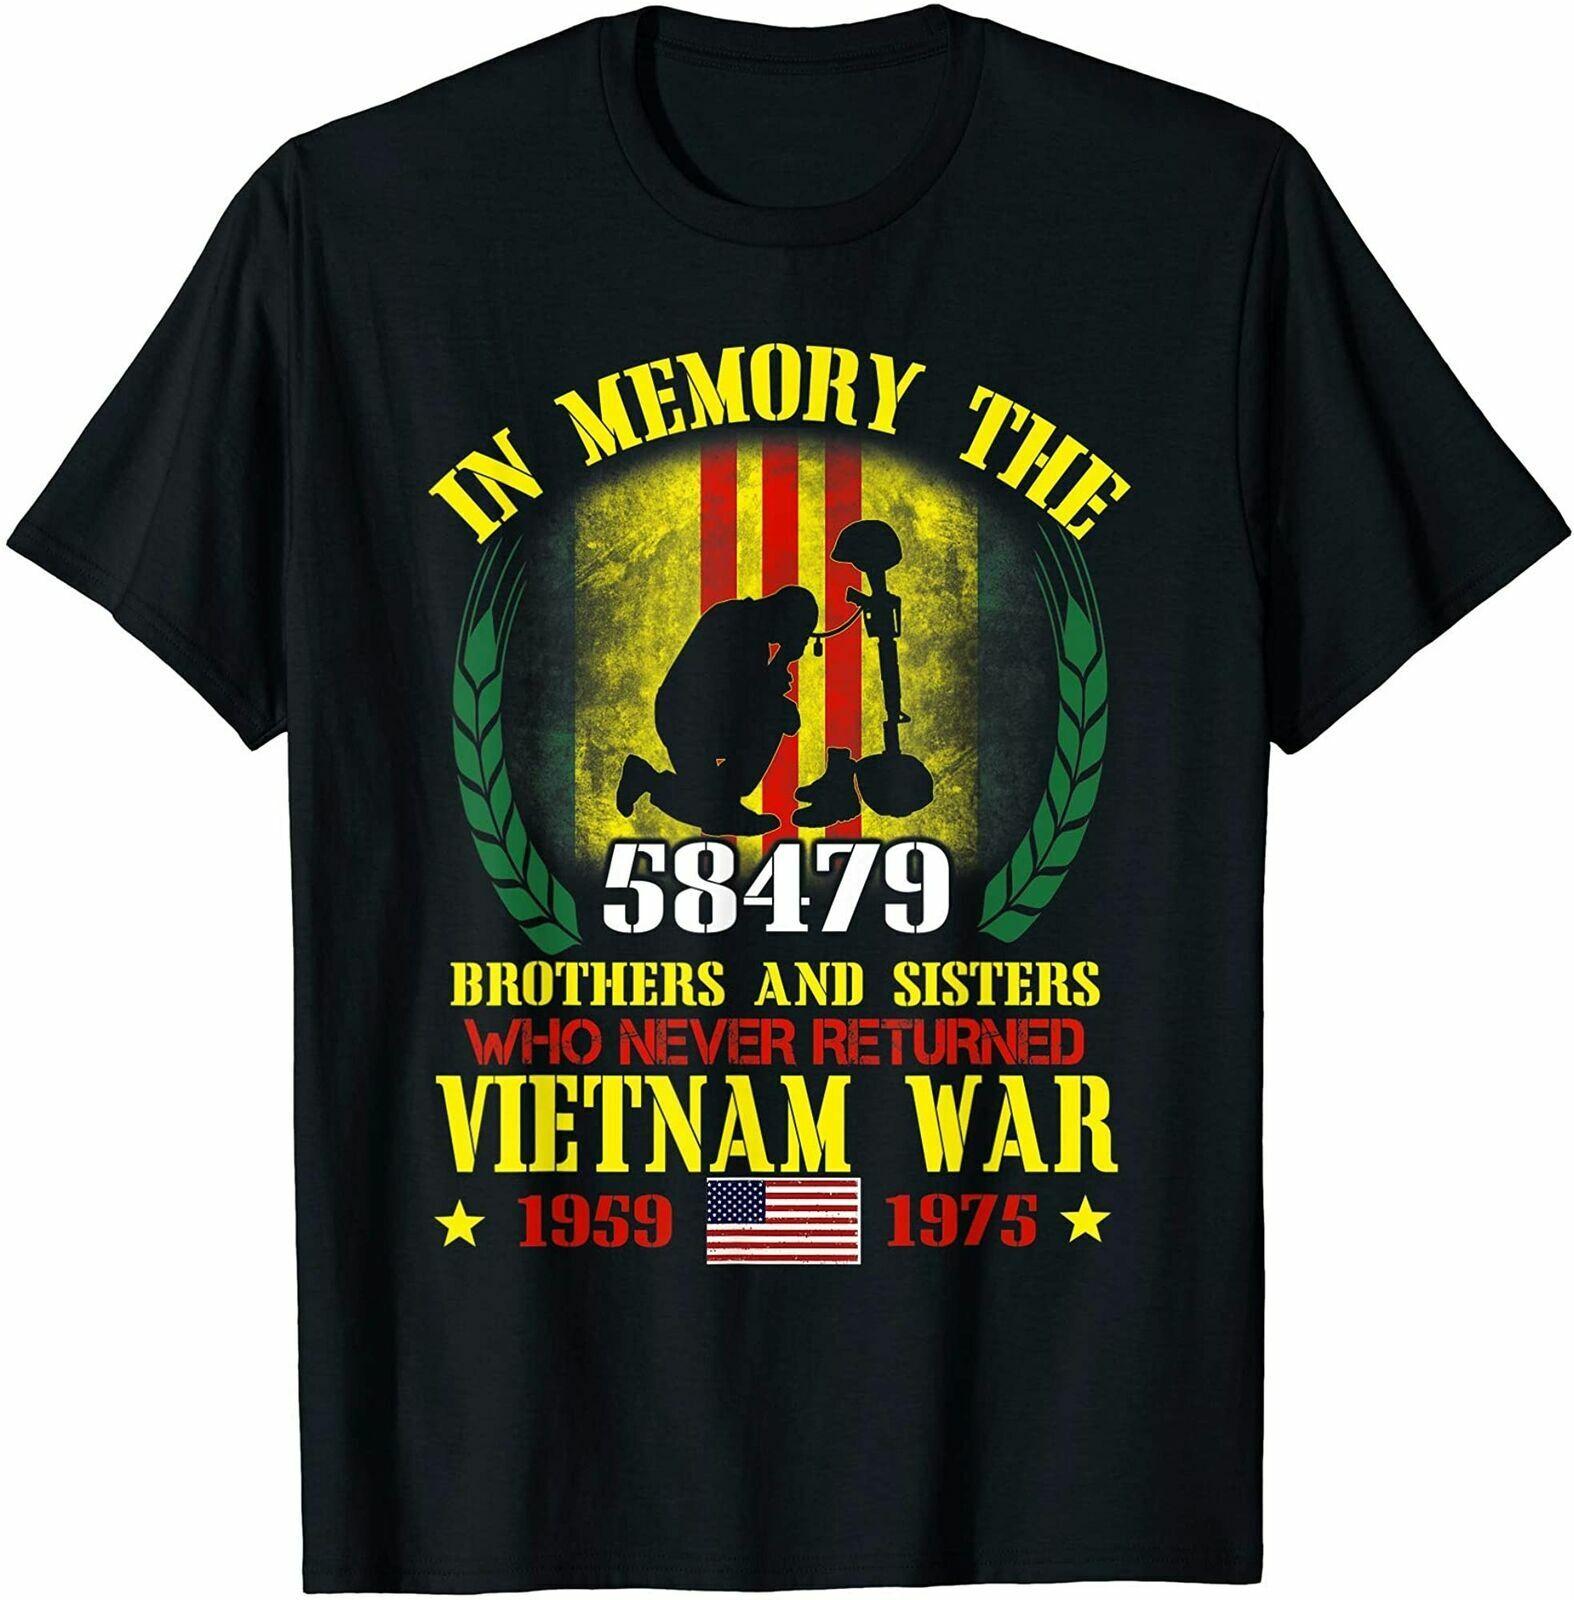 Vietnam Veteran In Memory The War Vietnam Gift T-Shirt Masswerks Store